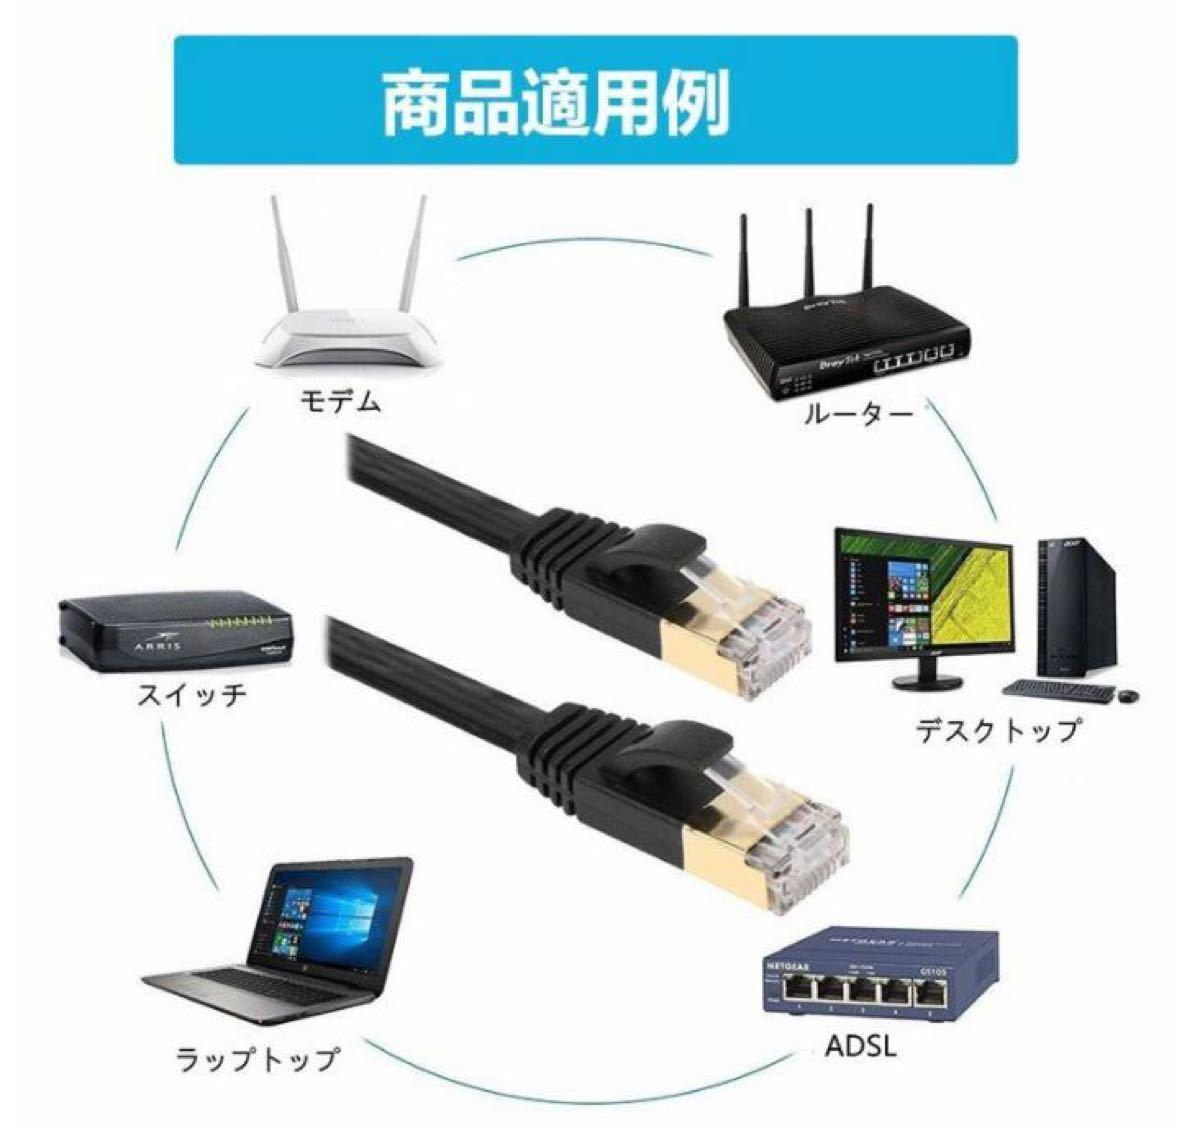 LANケーブル CAT8 15m RJ45 40ギガビット 高速光通信対応